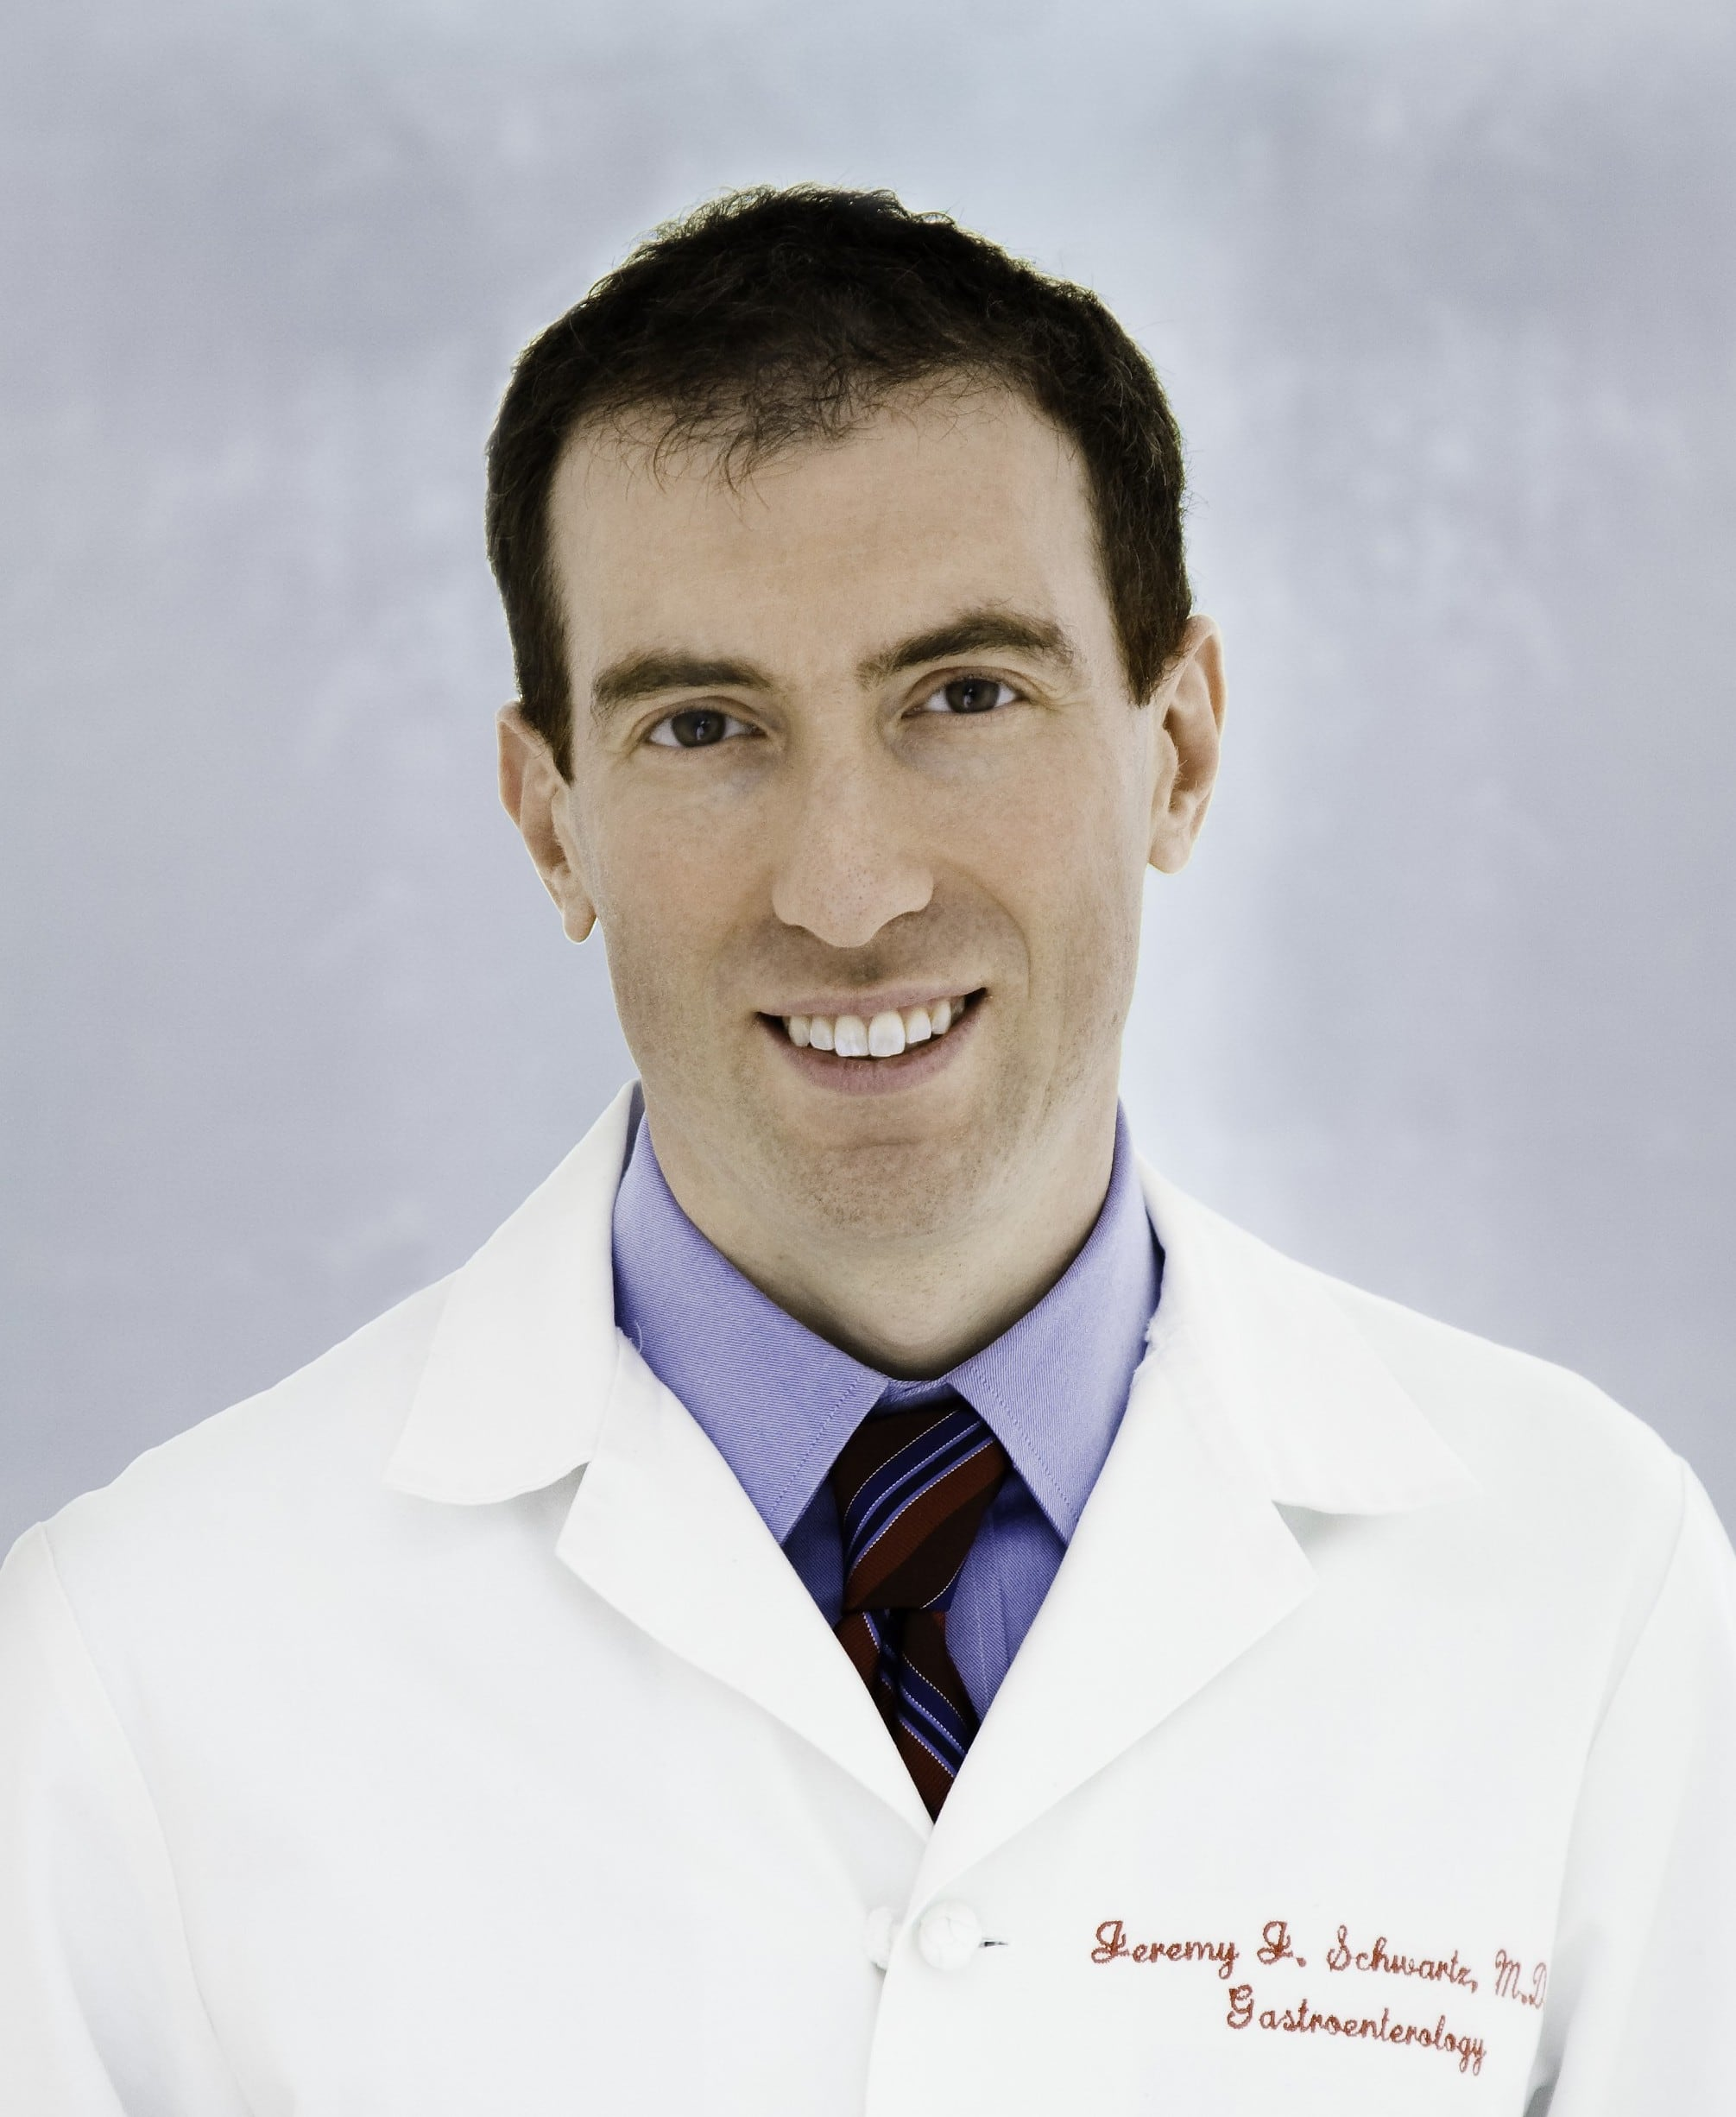 Jeremy J Schwartz, MD Gastroenterology